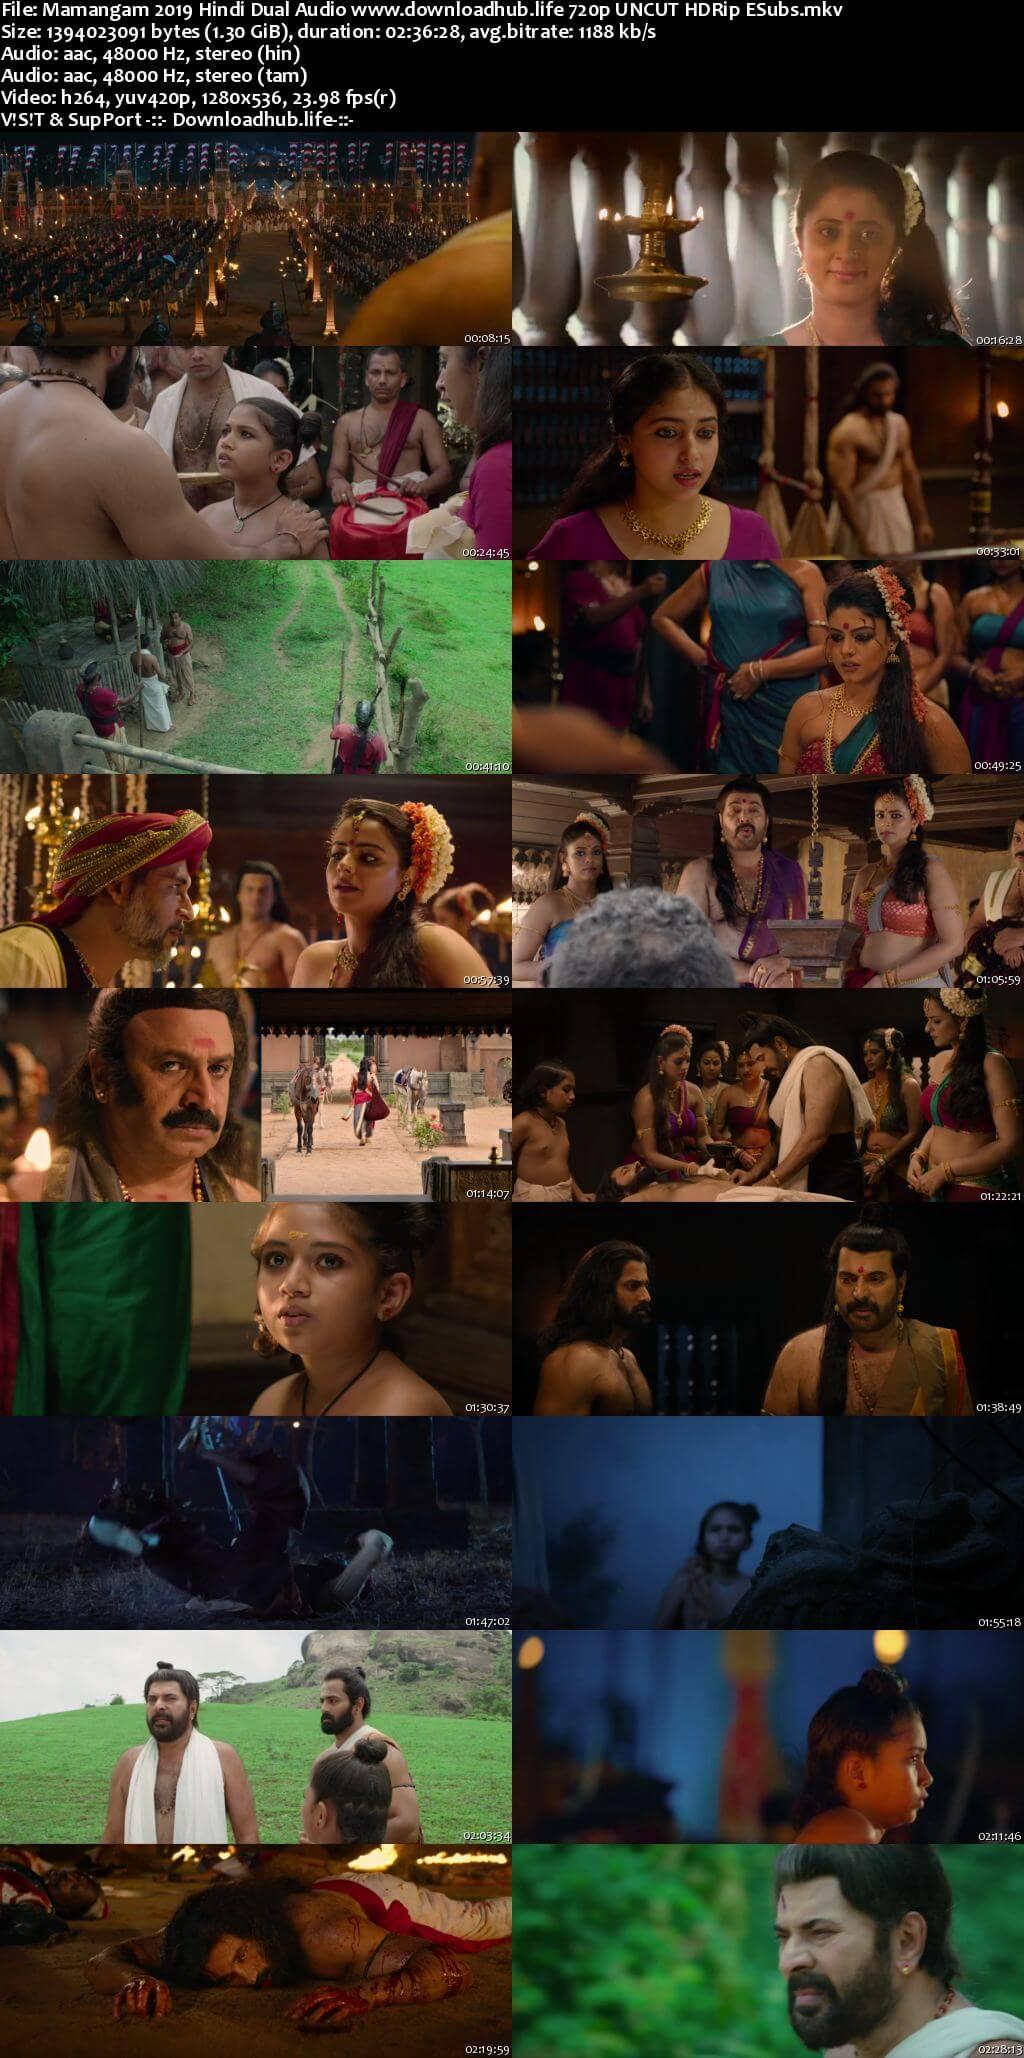 Mamangam 2019 Hindi Dual Audio 720p UNCUT HDRip ESubs